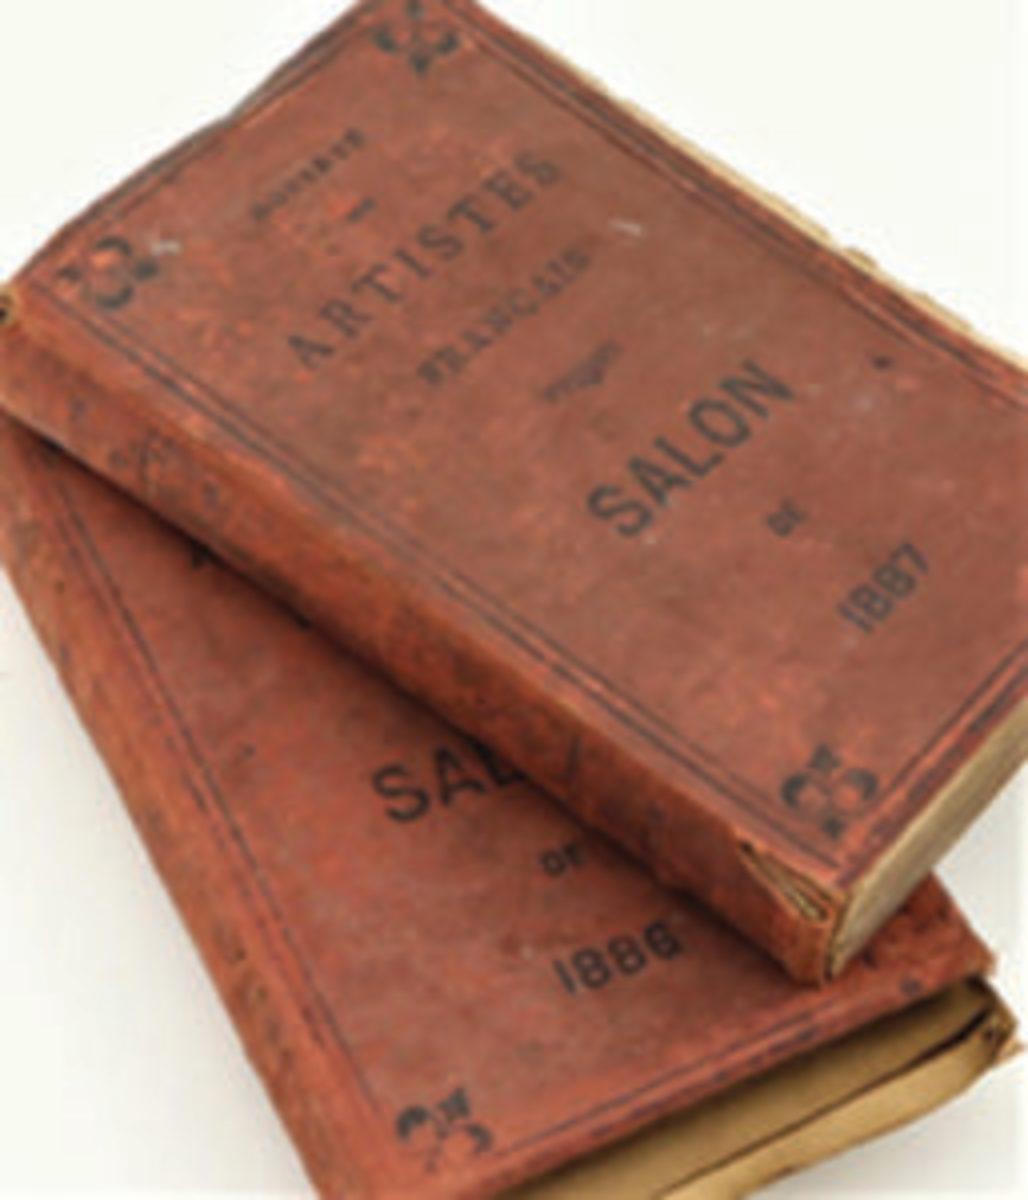 Patrick's copies of Societe des Aristes